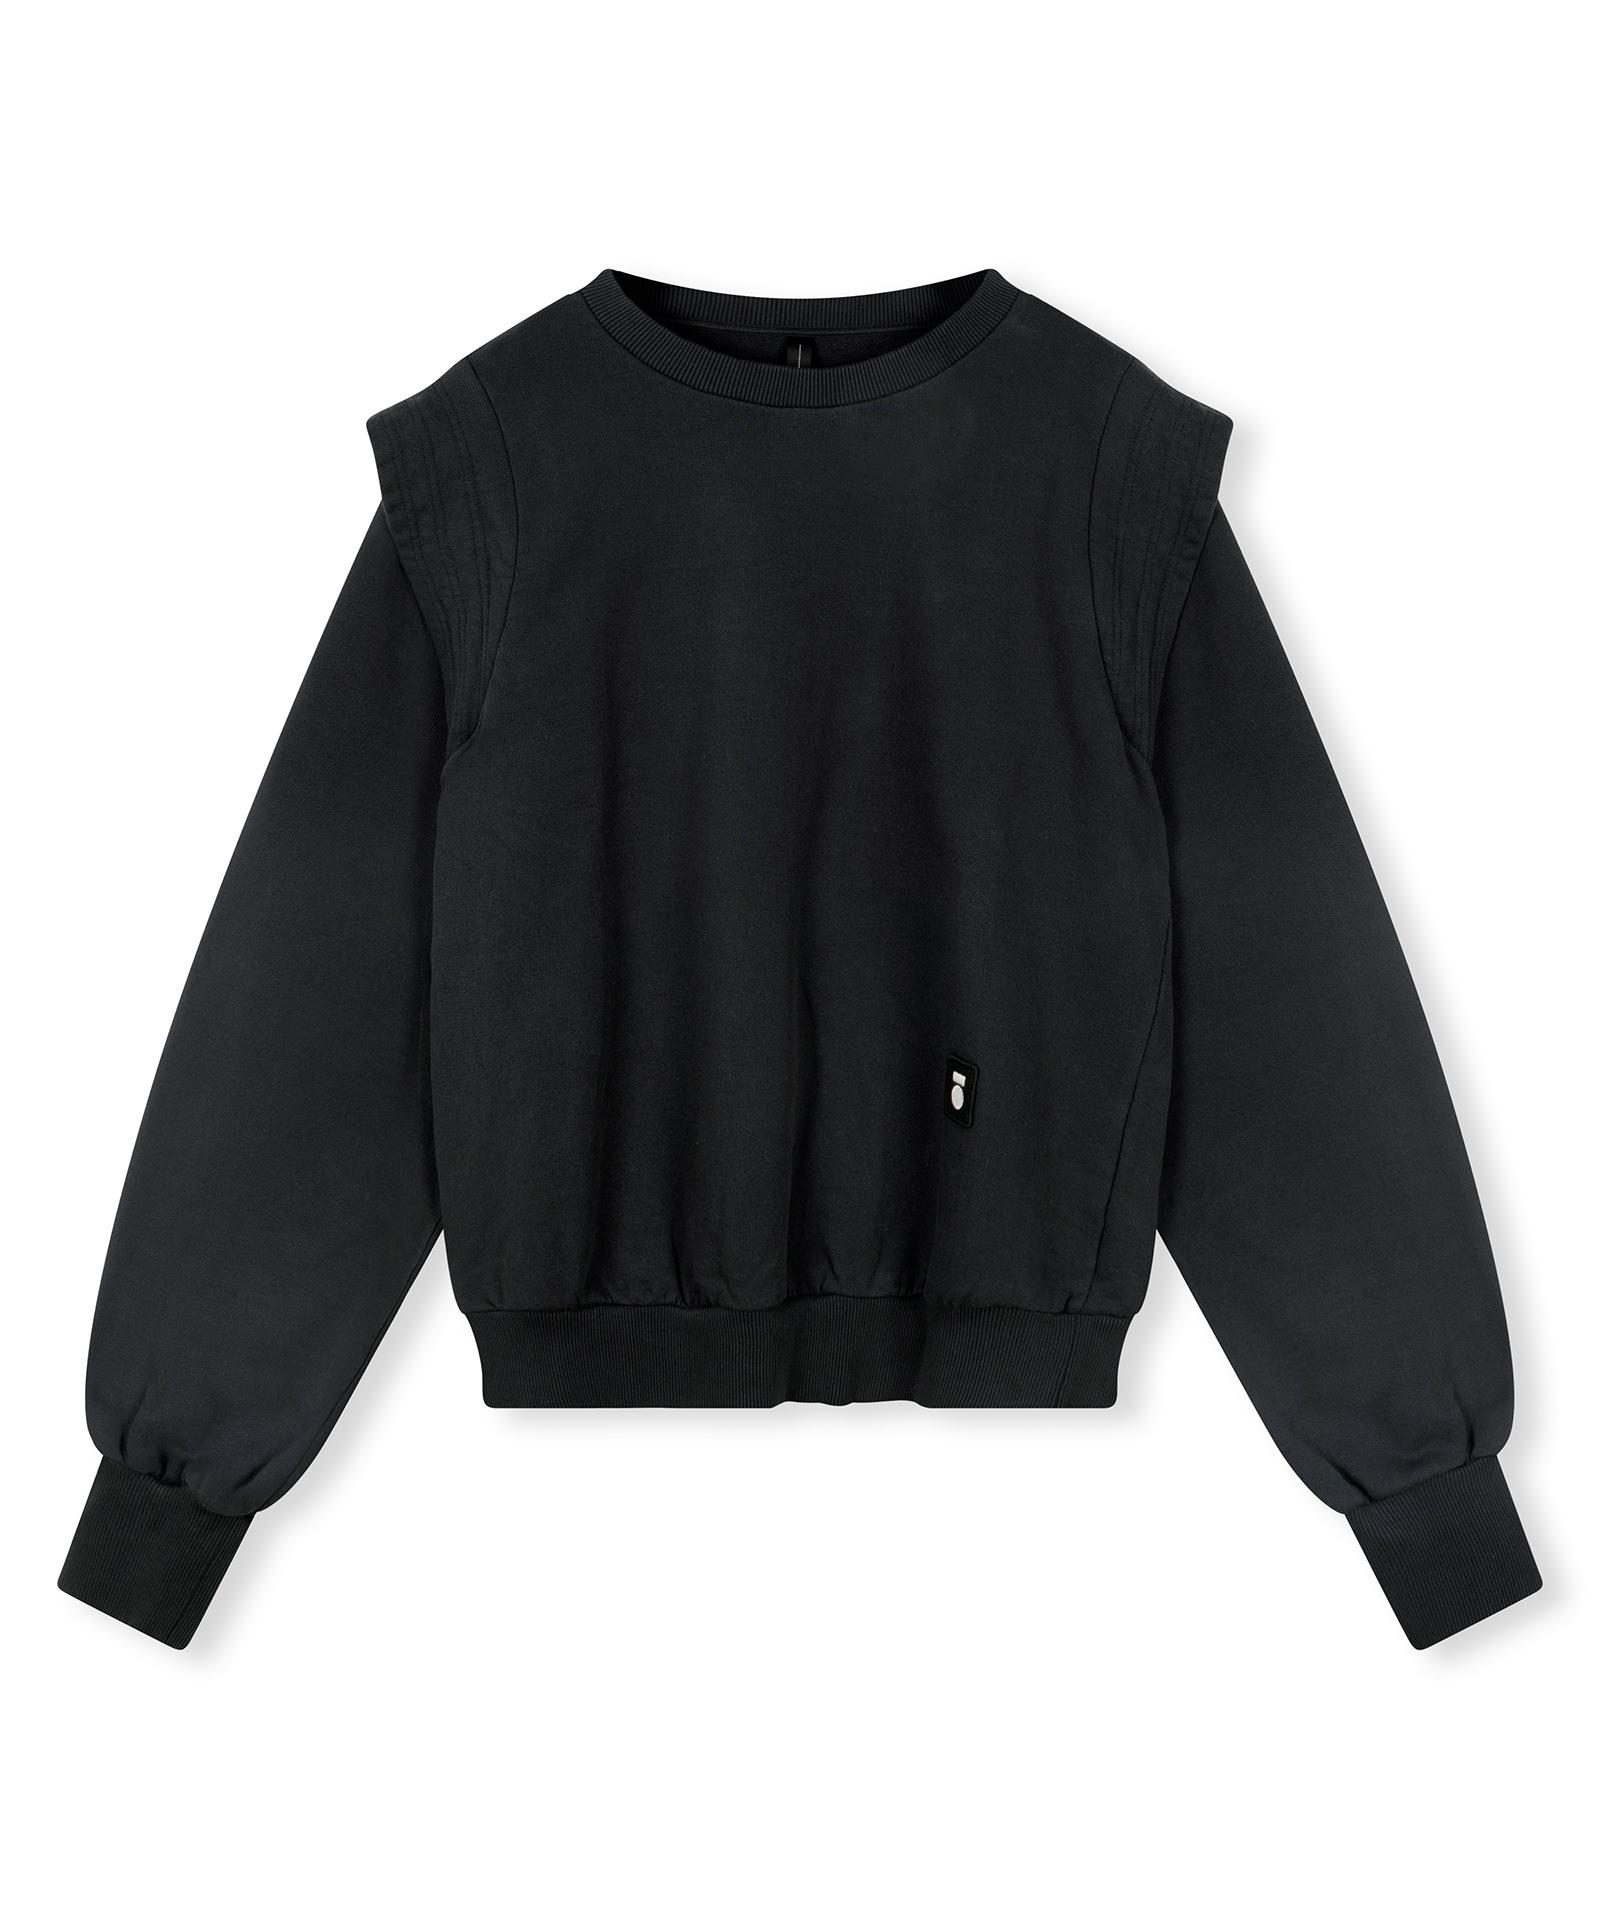 Sweater Statement Shoulder - Almost black